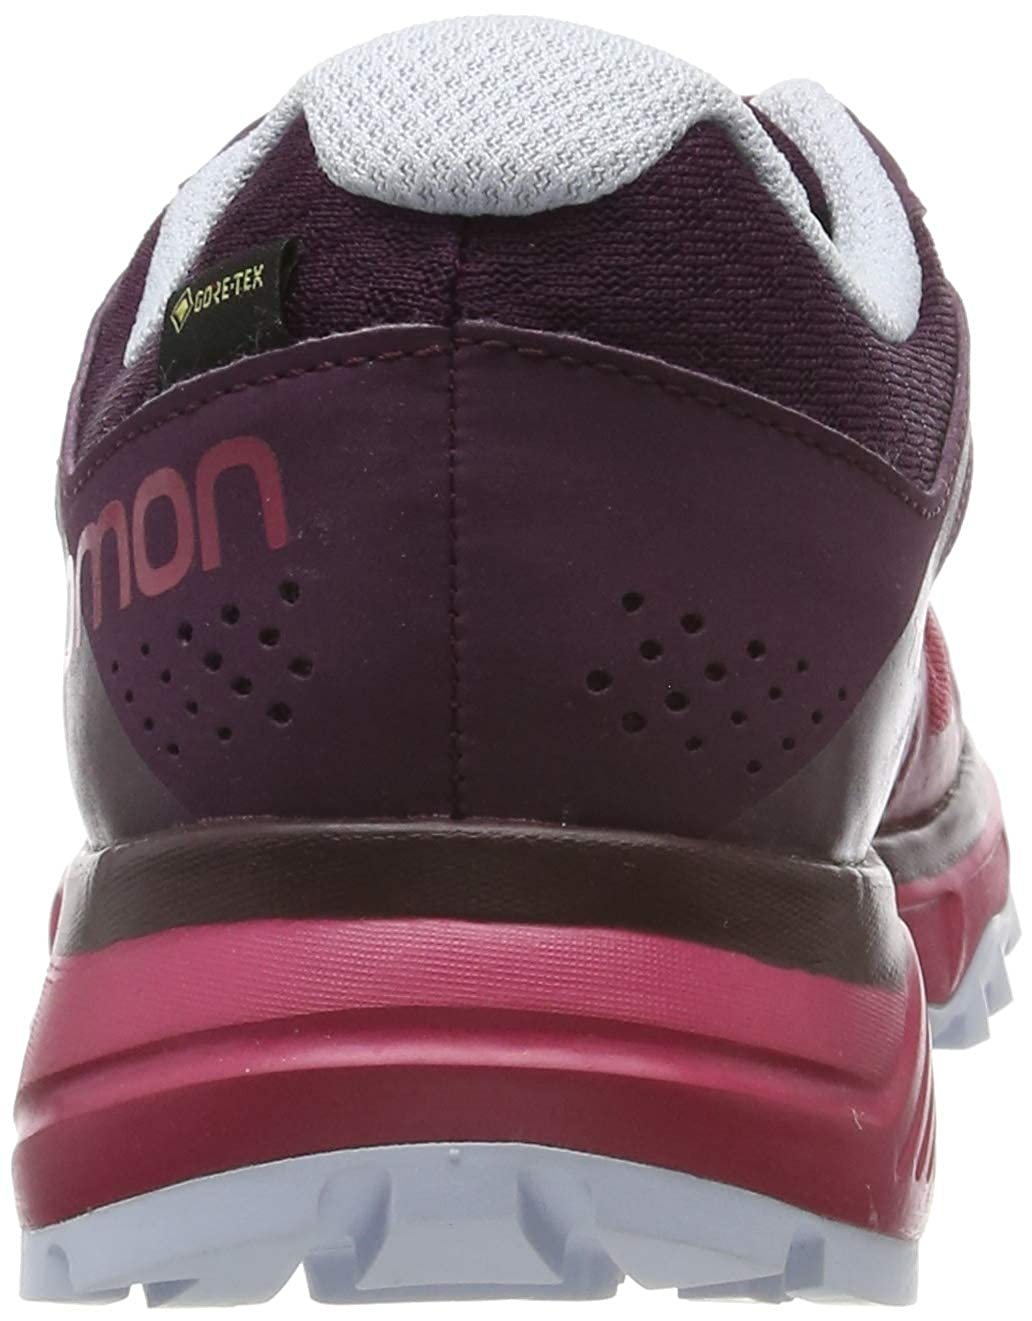 modelos de zapatillas salomon para hombres 4x4